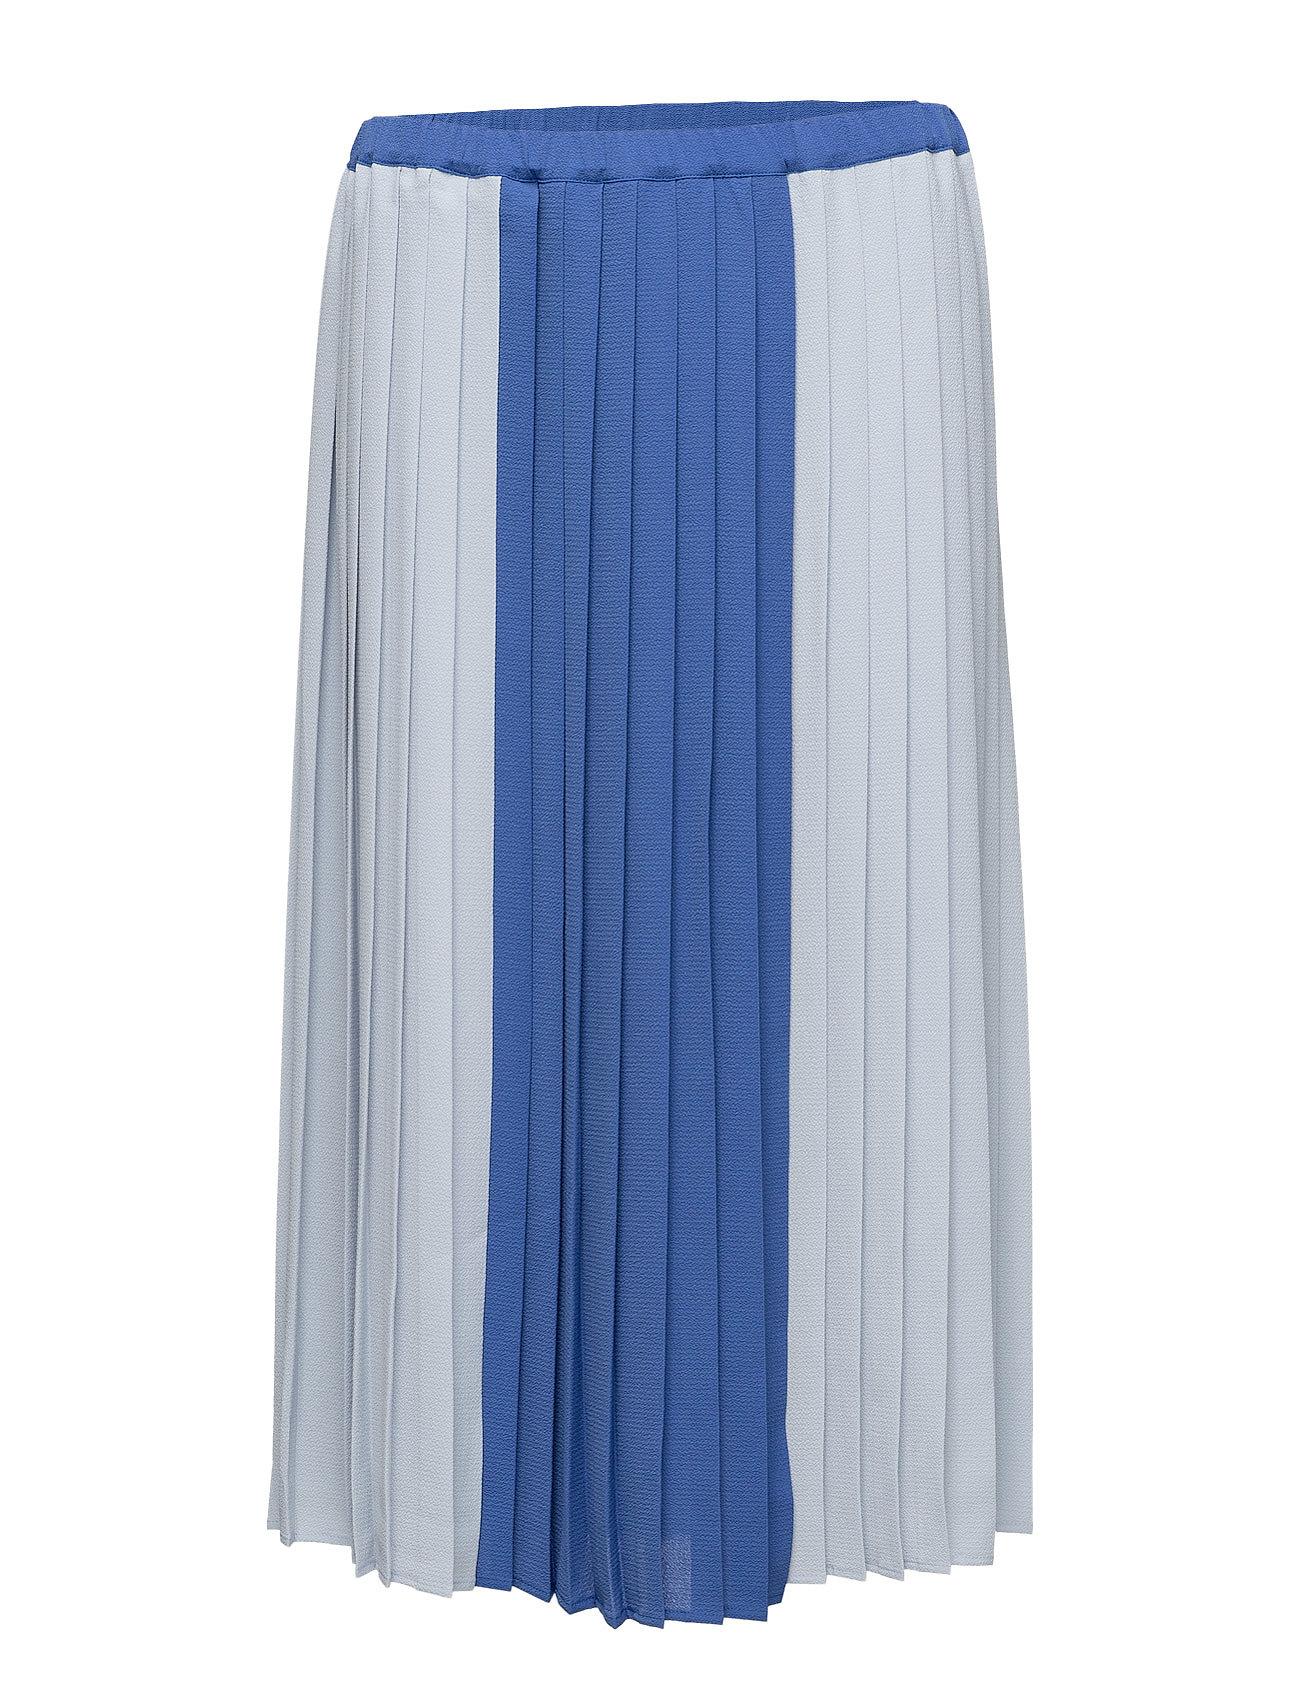 Gea (Cornflower Blue) (531.60 kr) - Pennyblack -  c360fdaba9c9